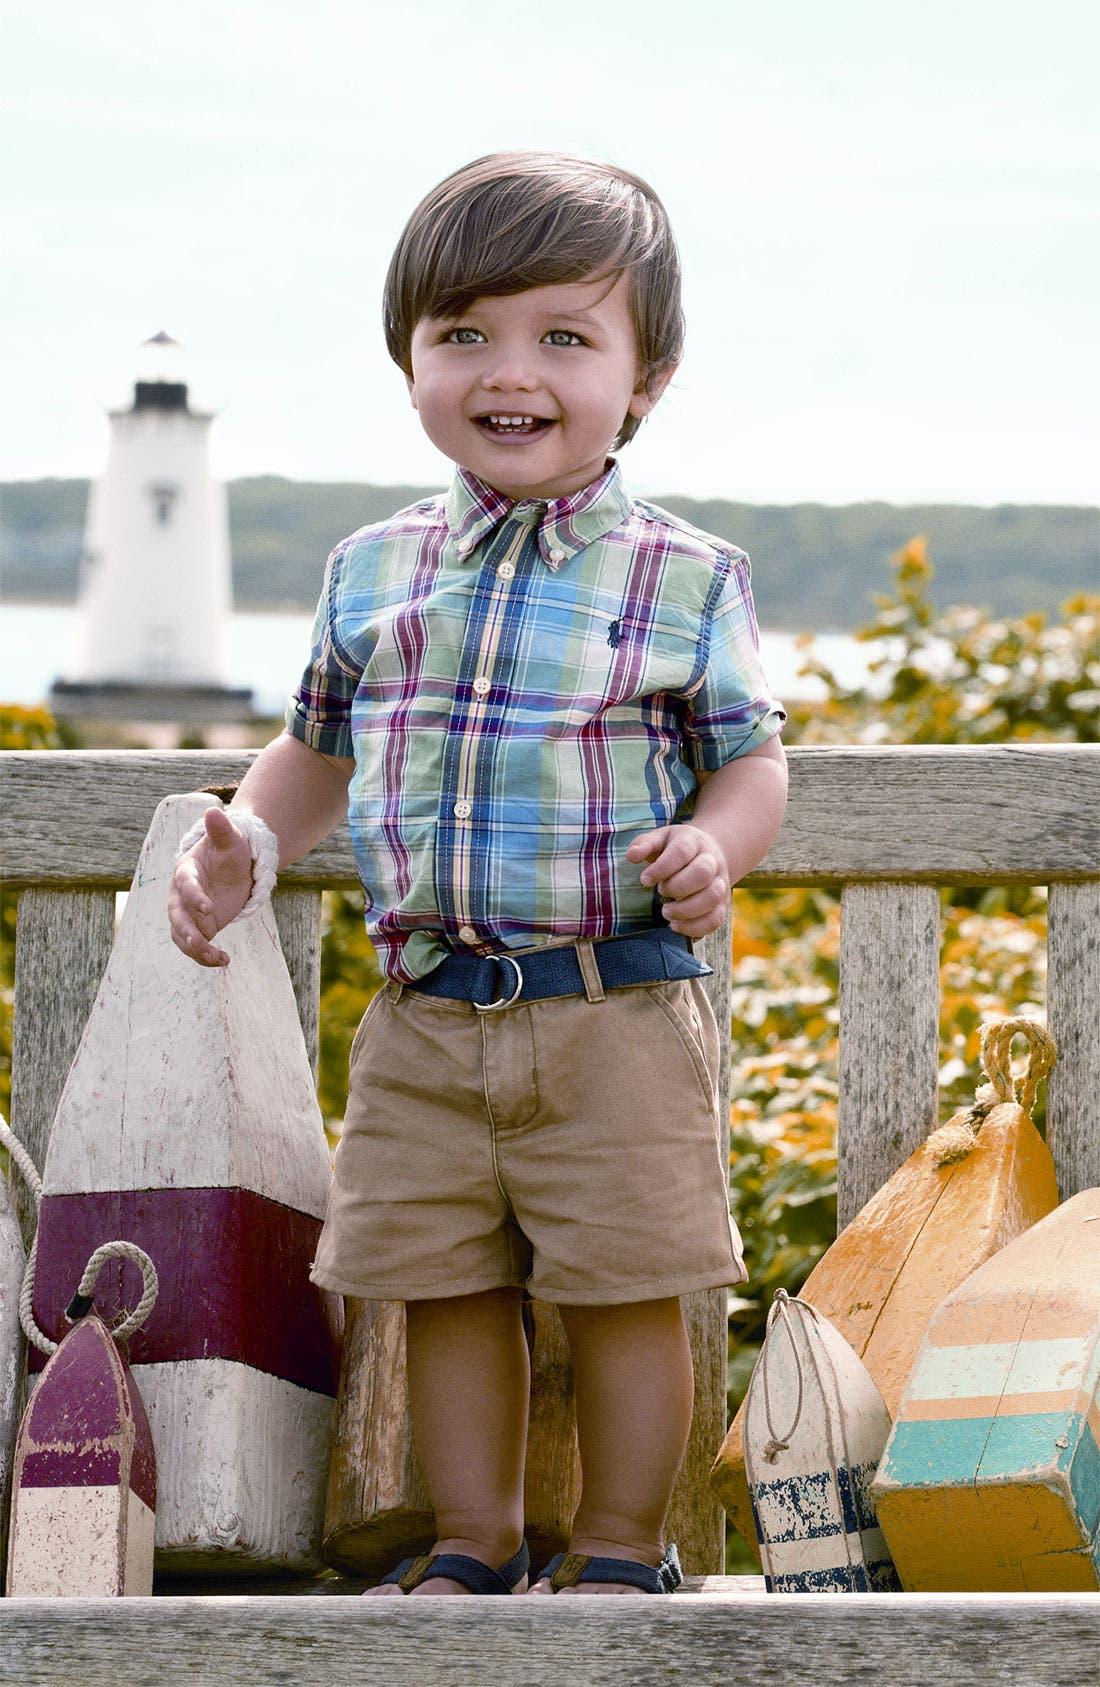 Alternate Image 1 Selected - Ralph Lauren Shirt, Shorts & Boat Shoe (Infant)